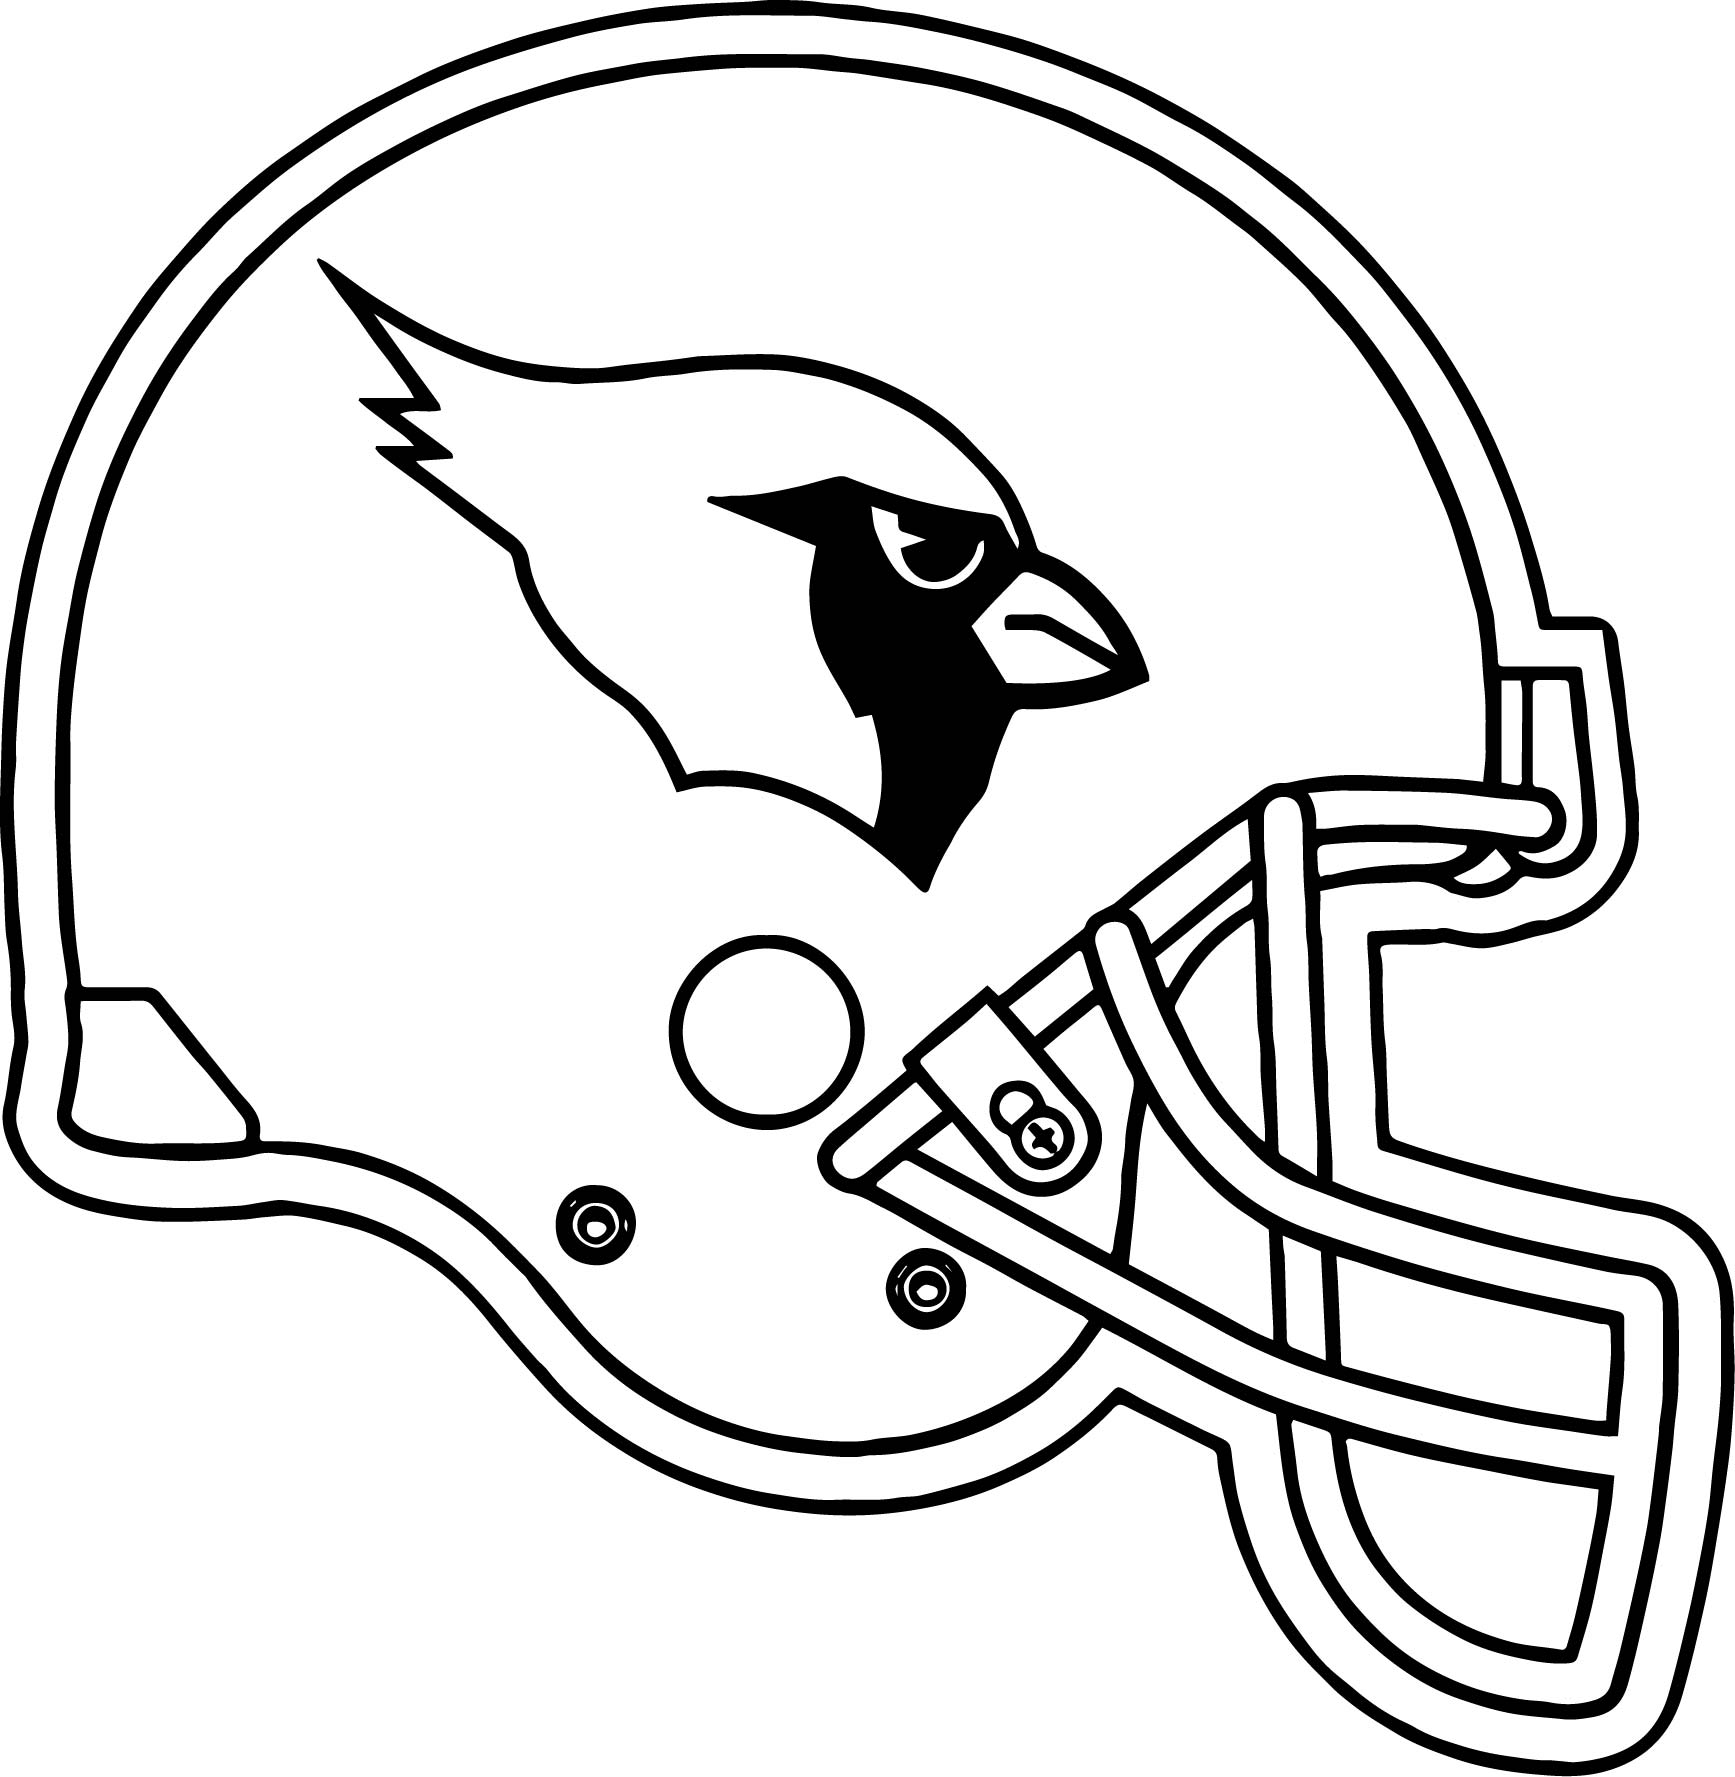 Arizona Cardinals Helmet Coloring Page Wecoloringpage